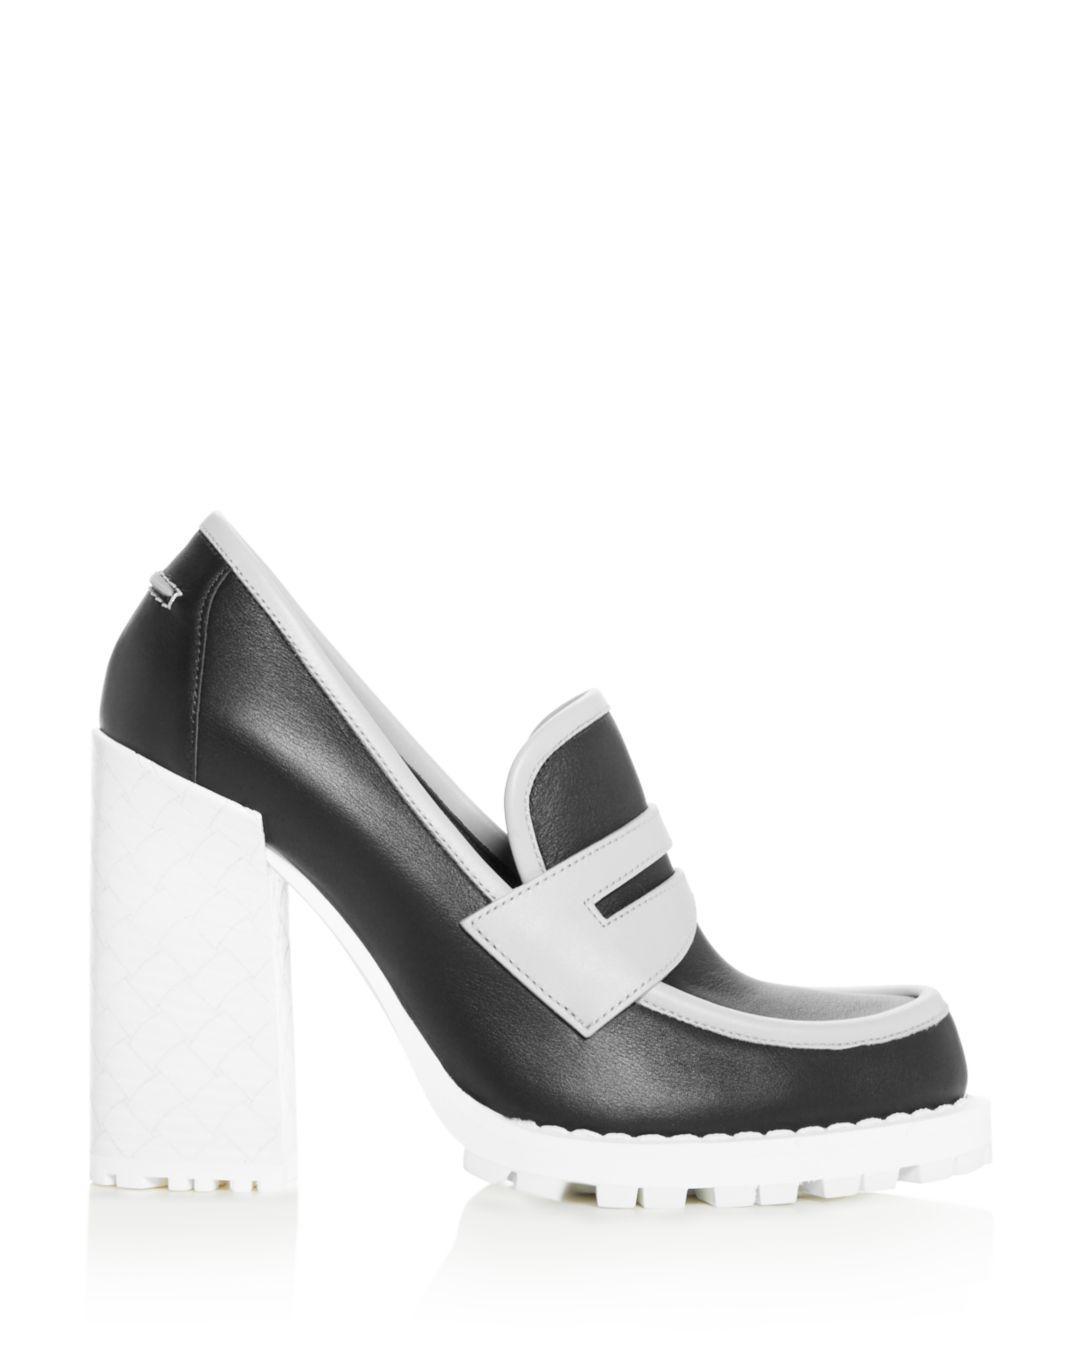 c59f4094277 Lyst - Bottega Veneta Women s High Block-heel Loafers